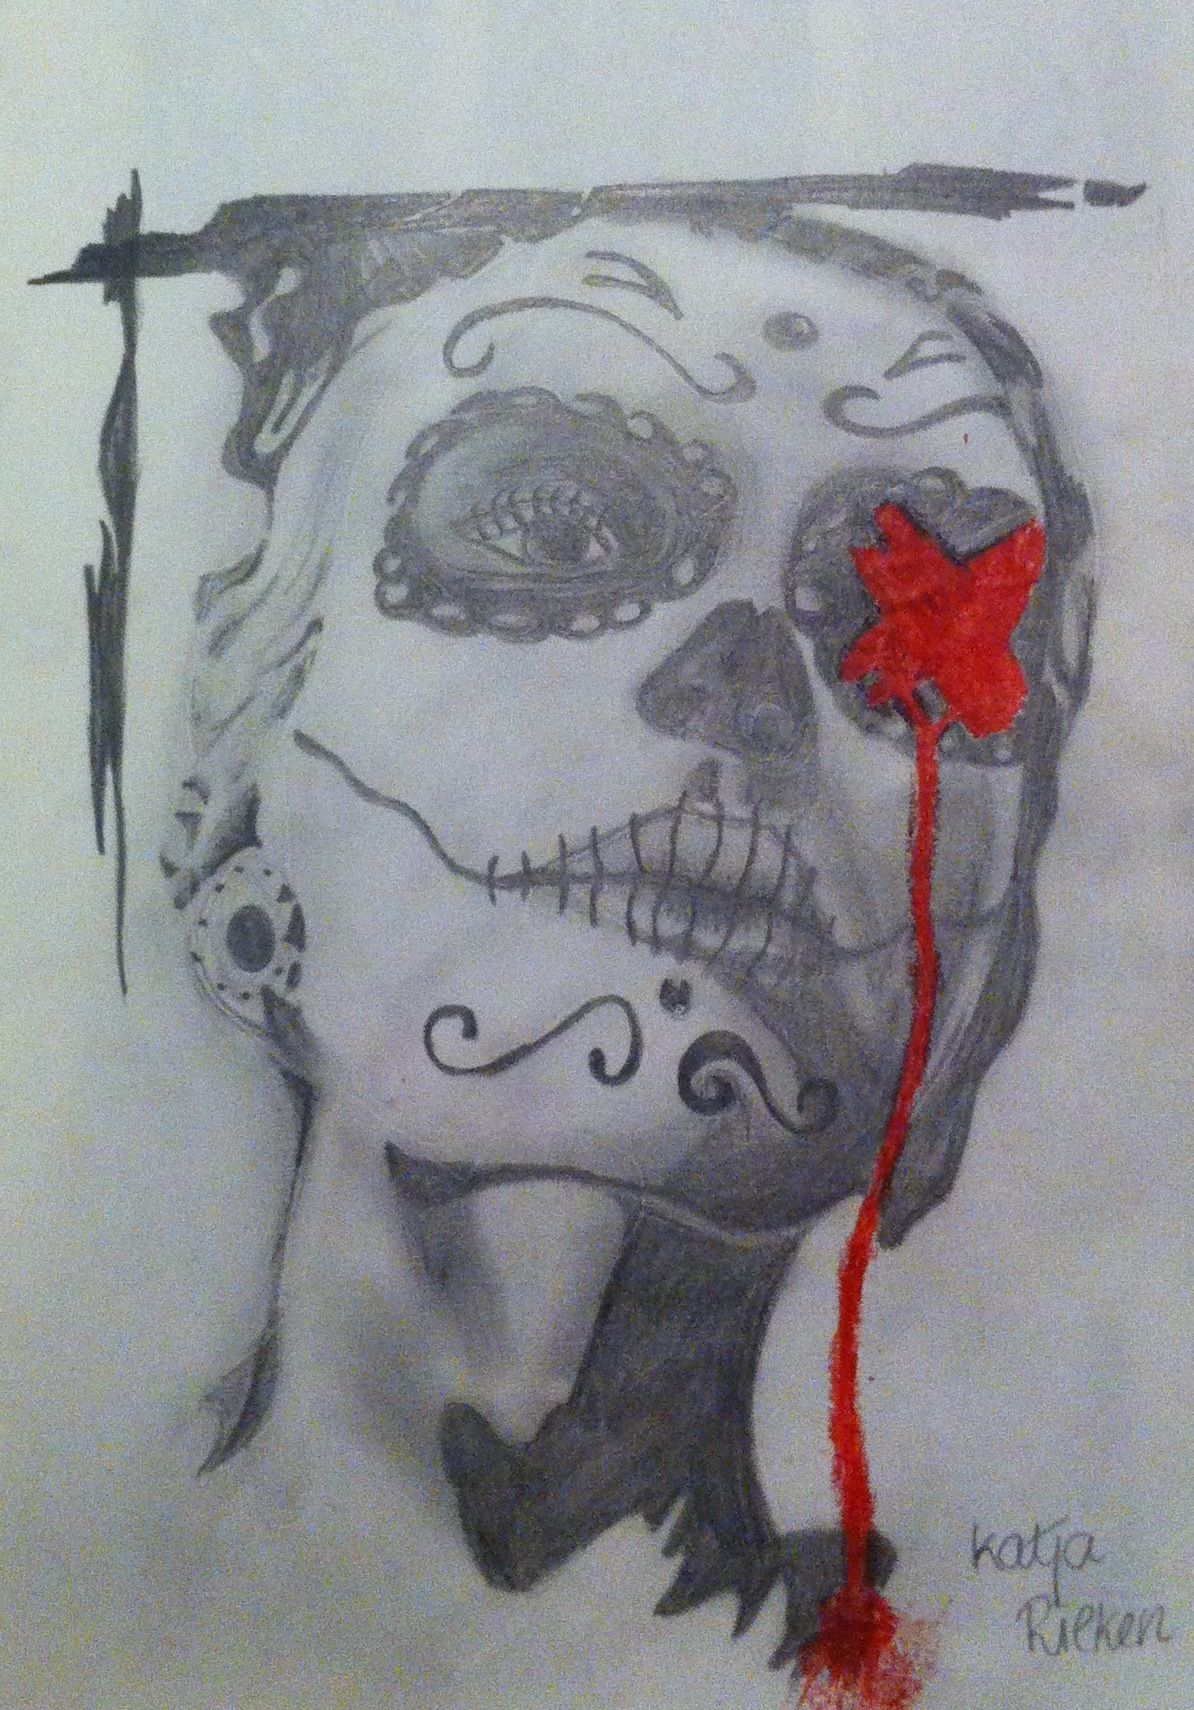 Dia de los muertos, 2013 - Personal work | Pinterest